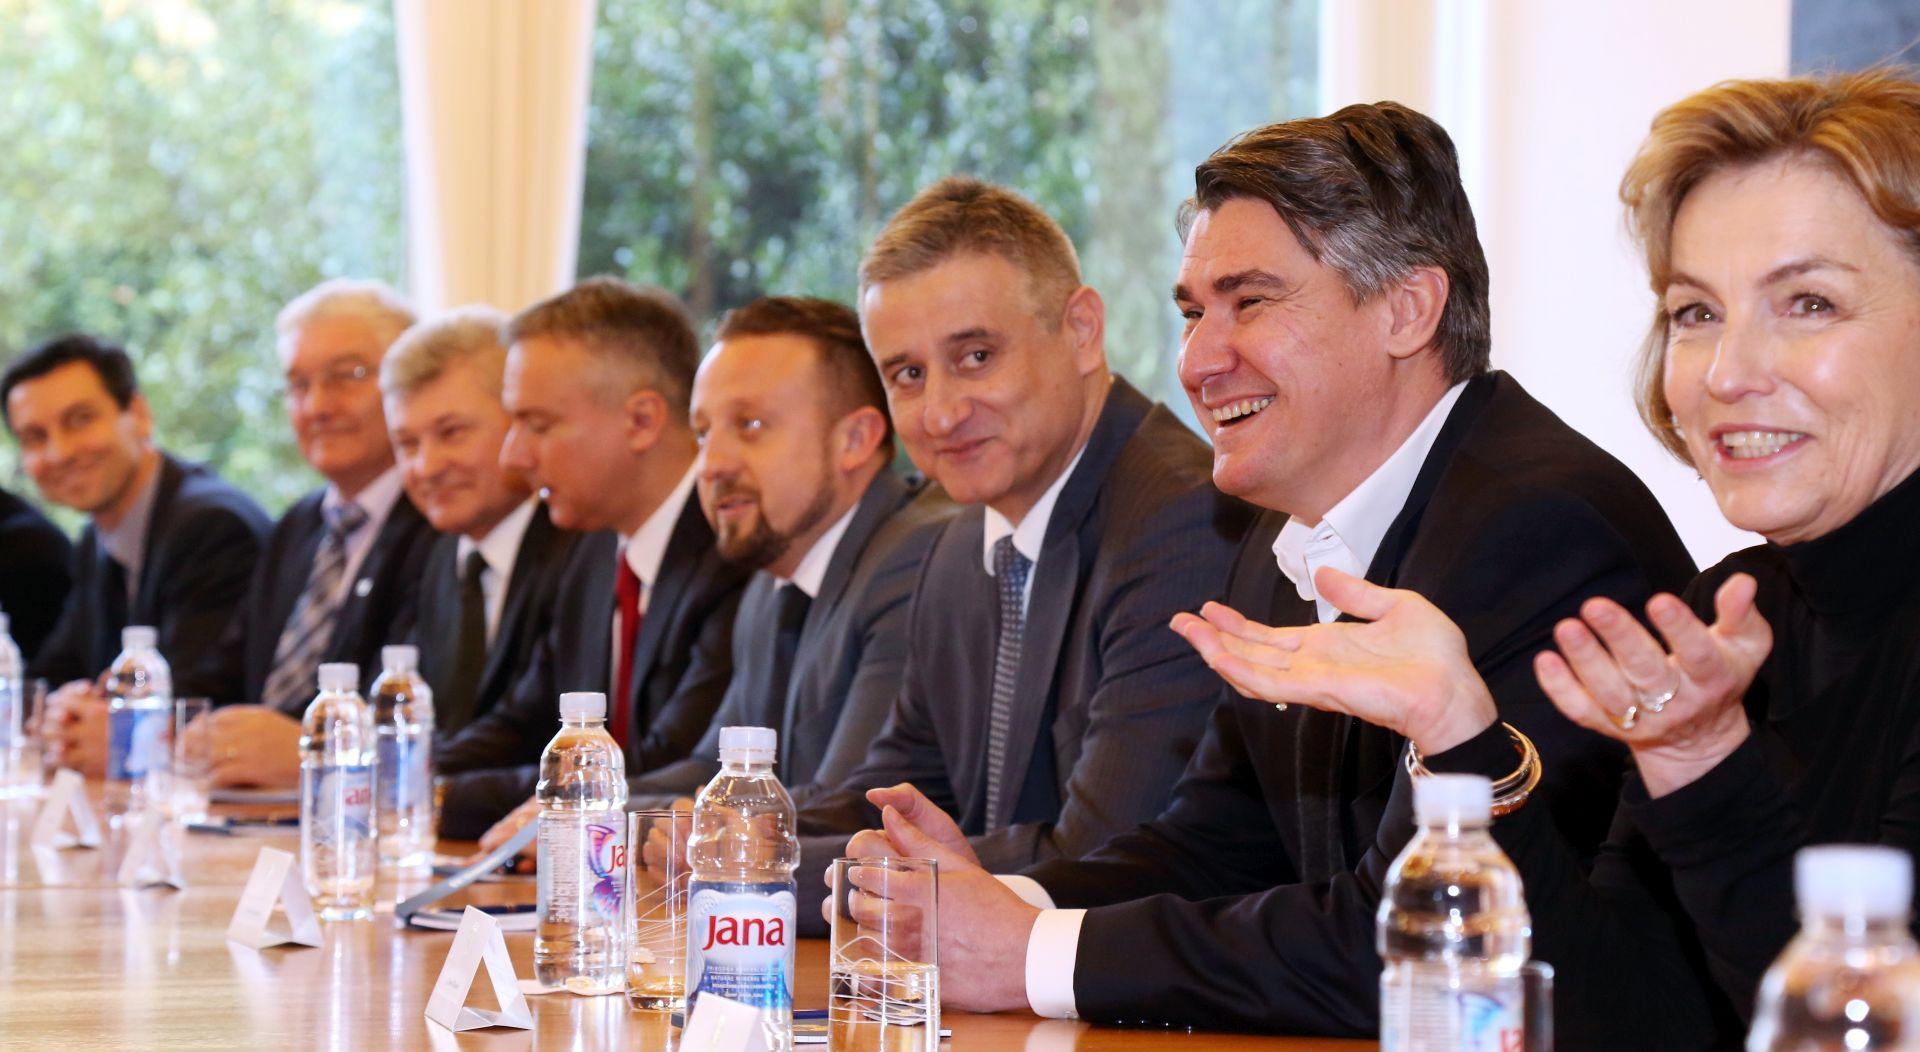 NOVI OBRAT U MOSTU: HDZ pozvan natrag za pregovarački stol